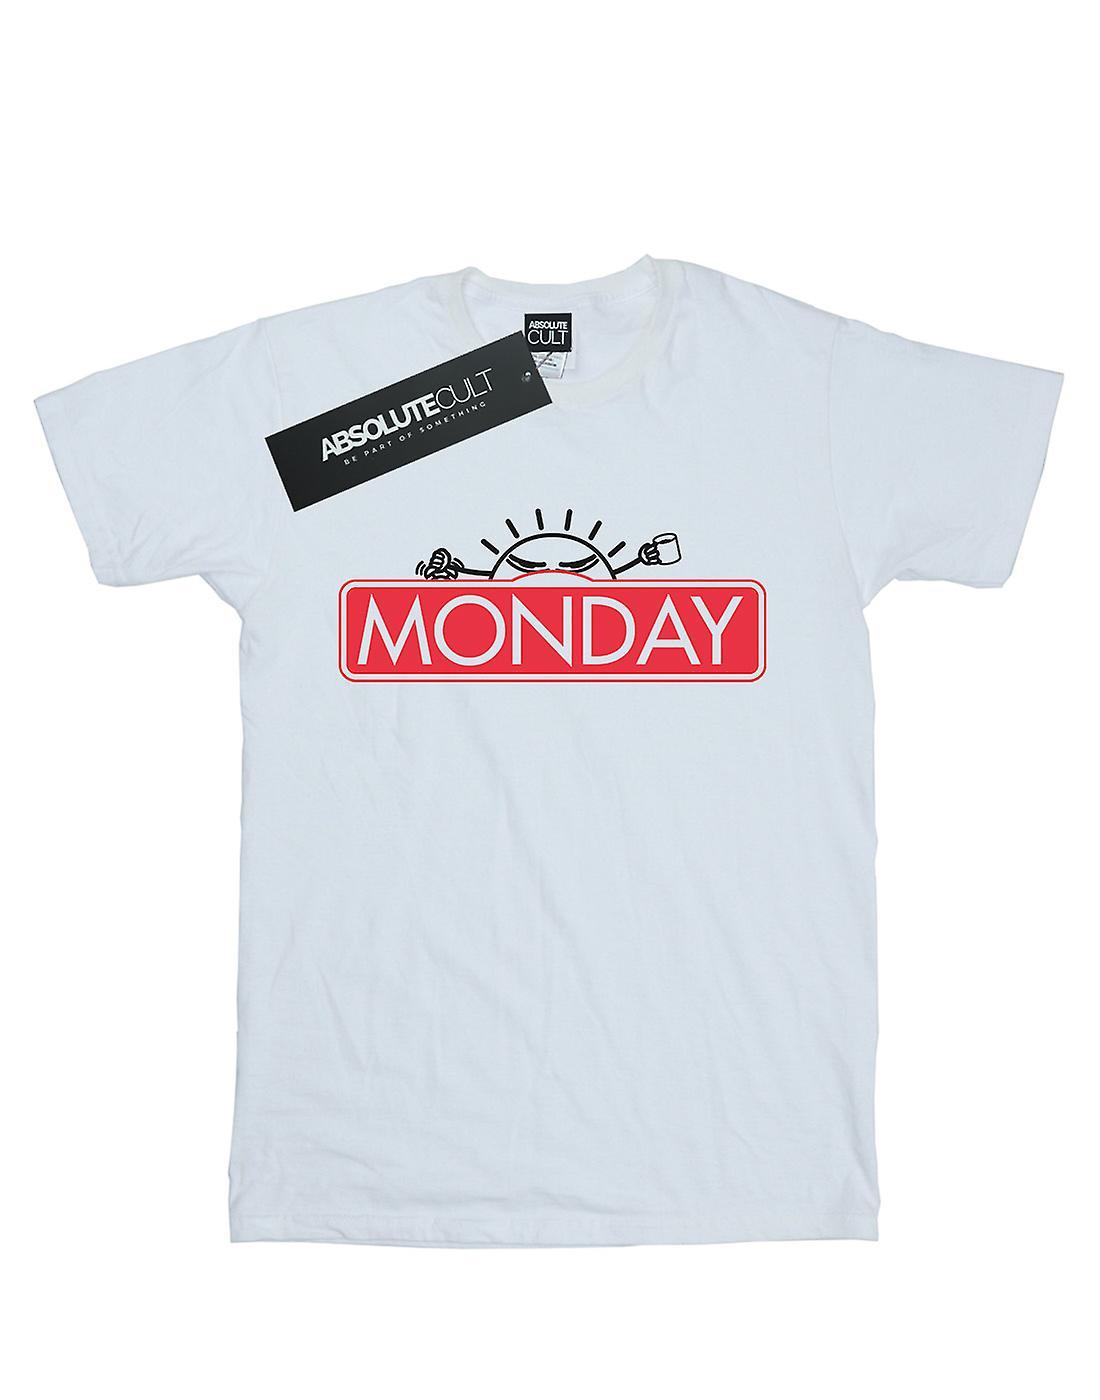 Ntesign Women's Monday Game Boyfriend Fit T-Shirt